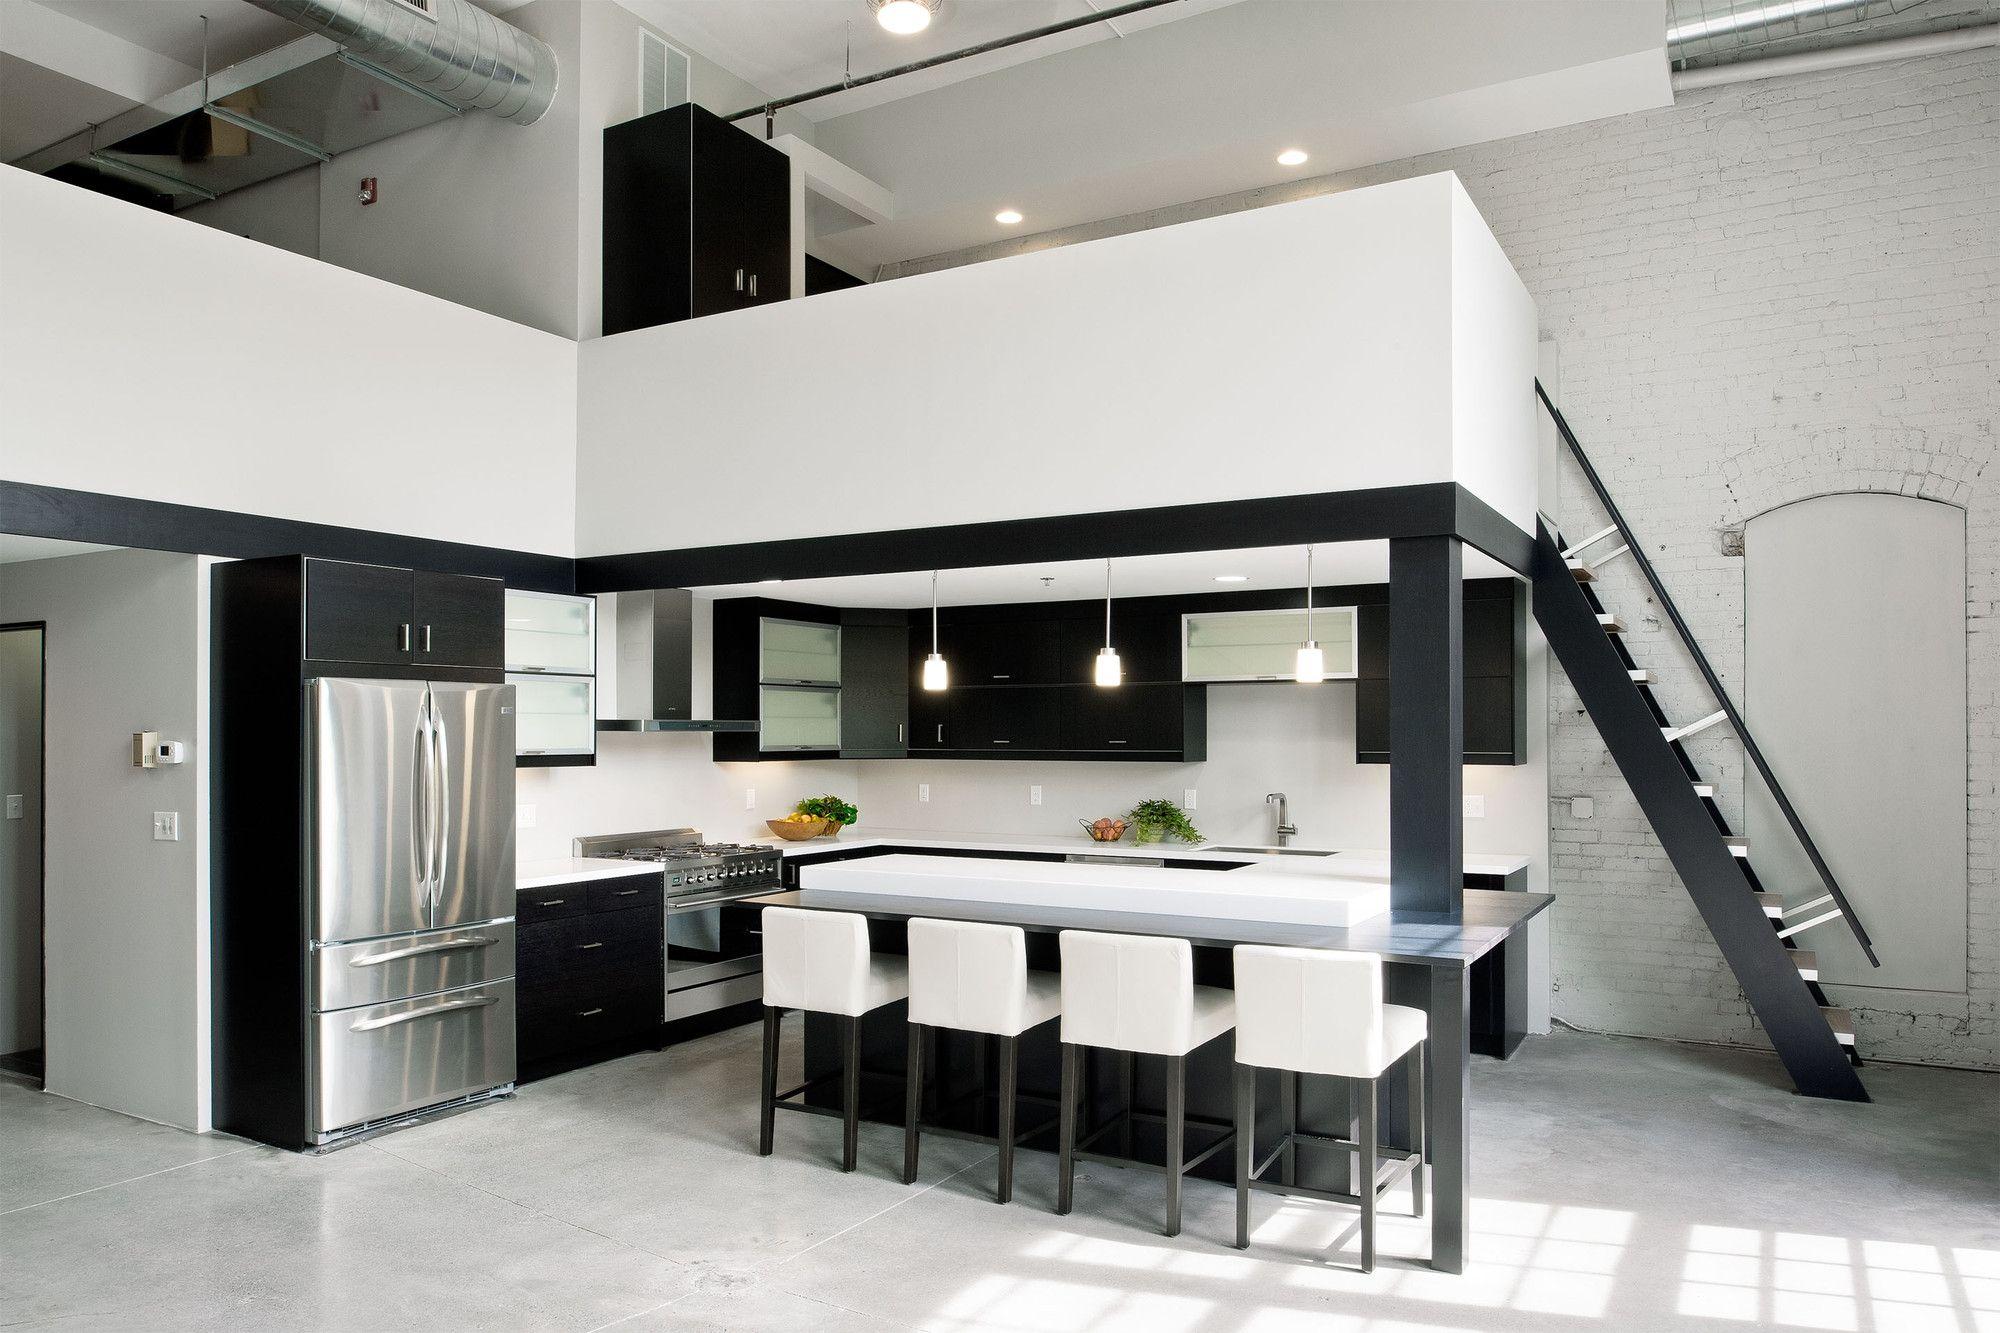 Gallery of Delin Boiler Room / Stack + Co. - 8